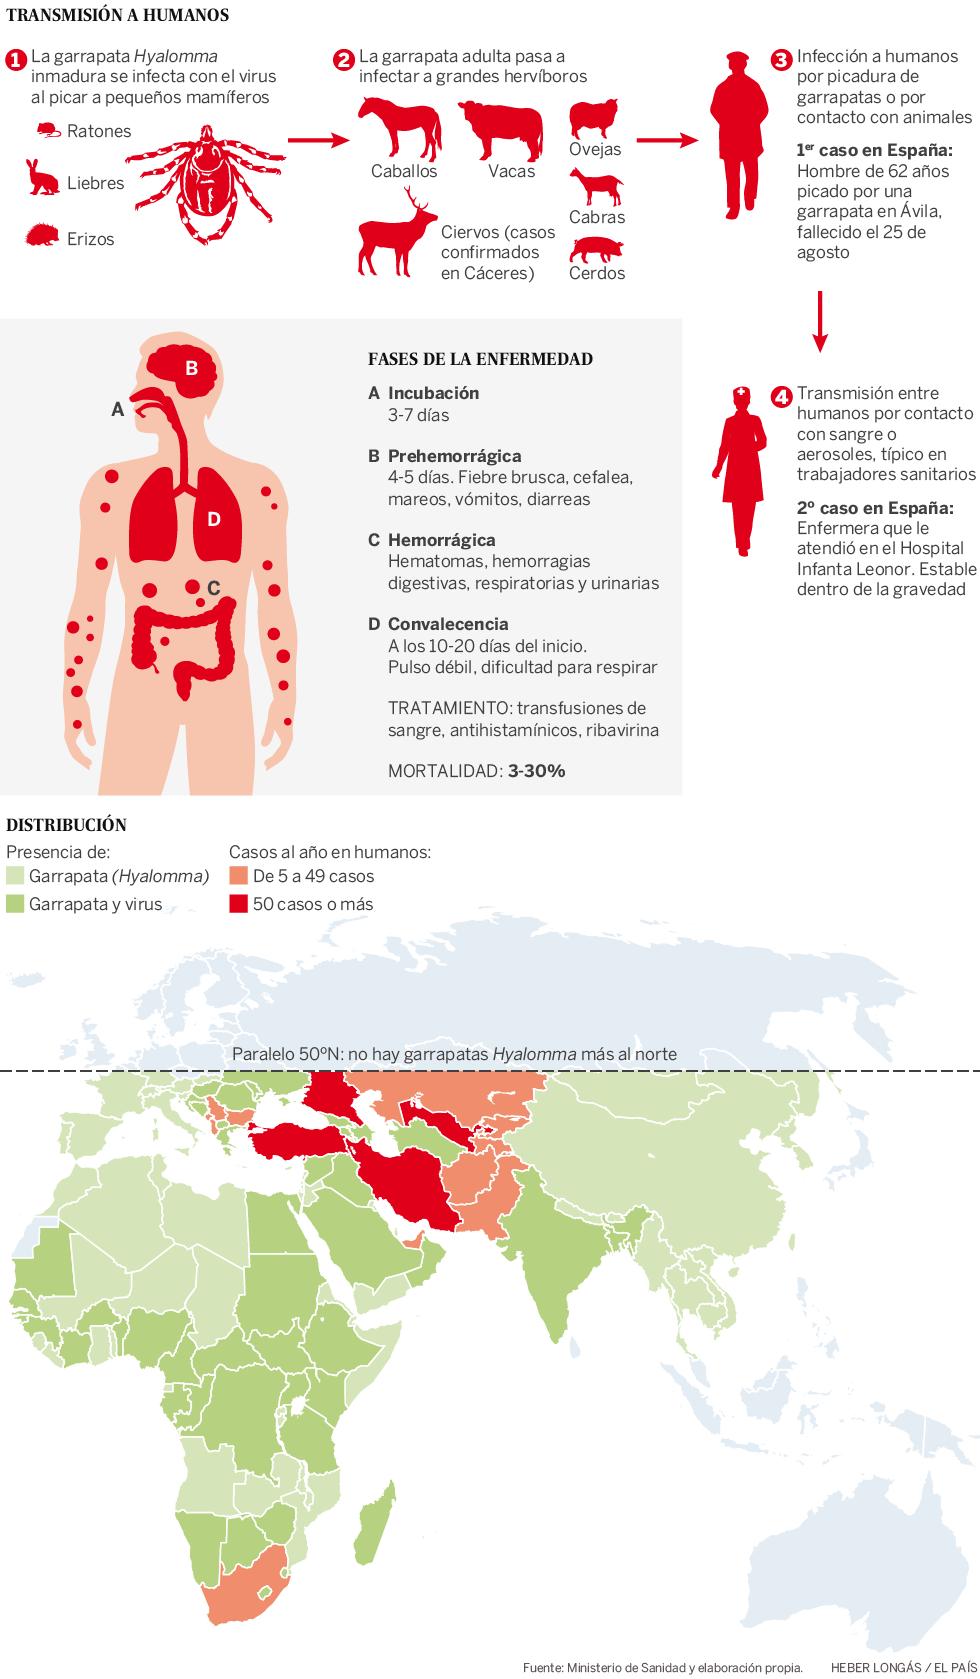 La fiebre hemorrágica de Crimea-Congo